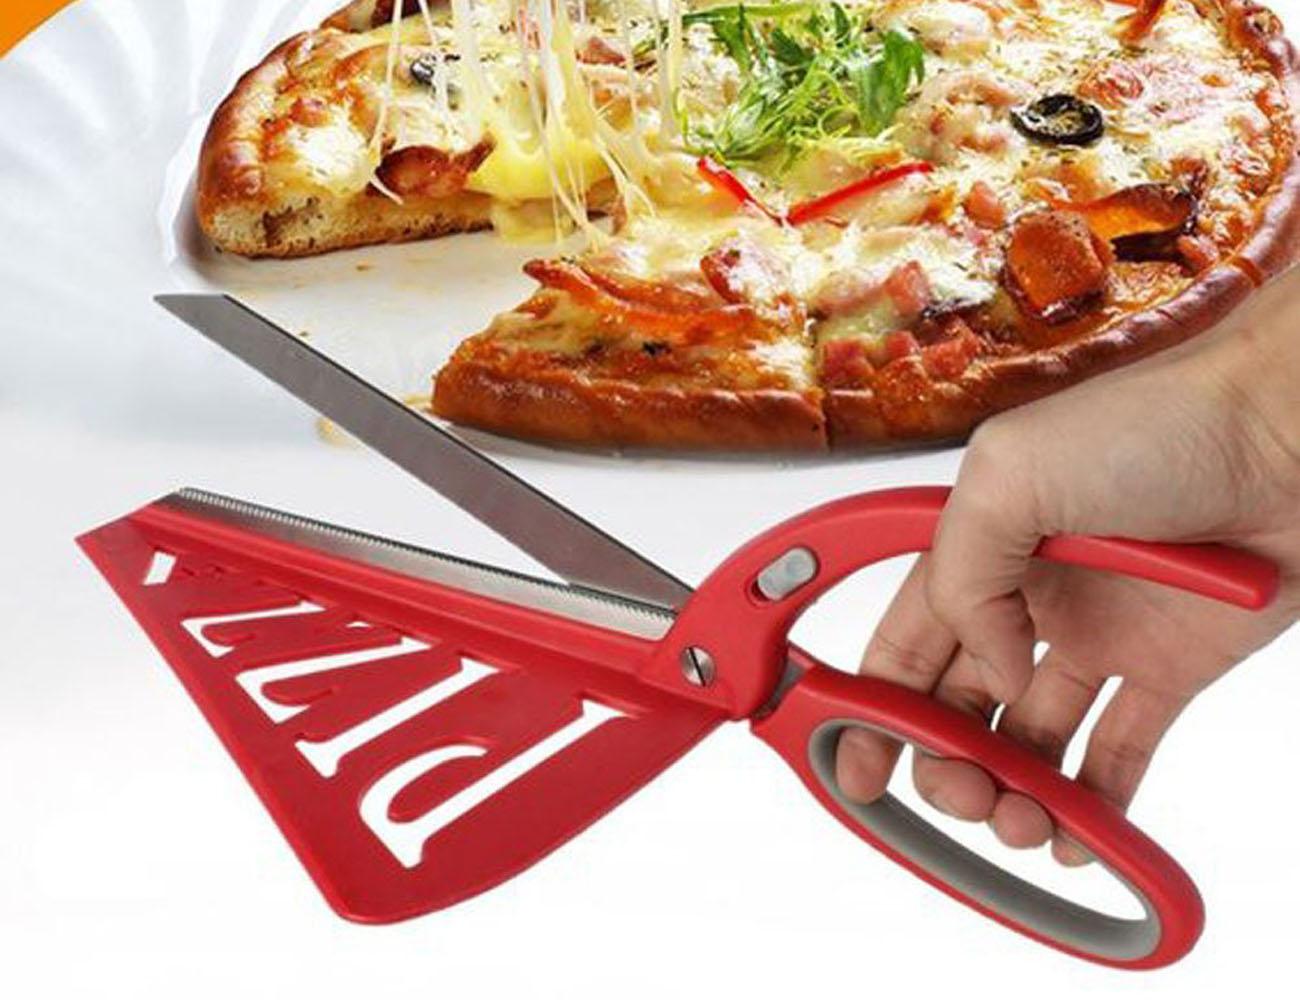 Pizza Scissors by Sagaform